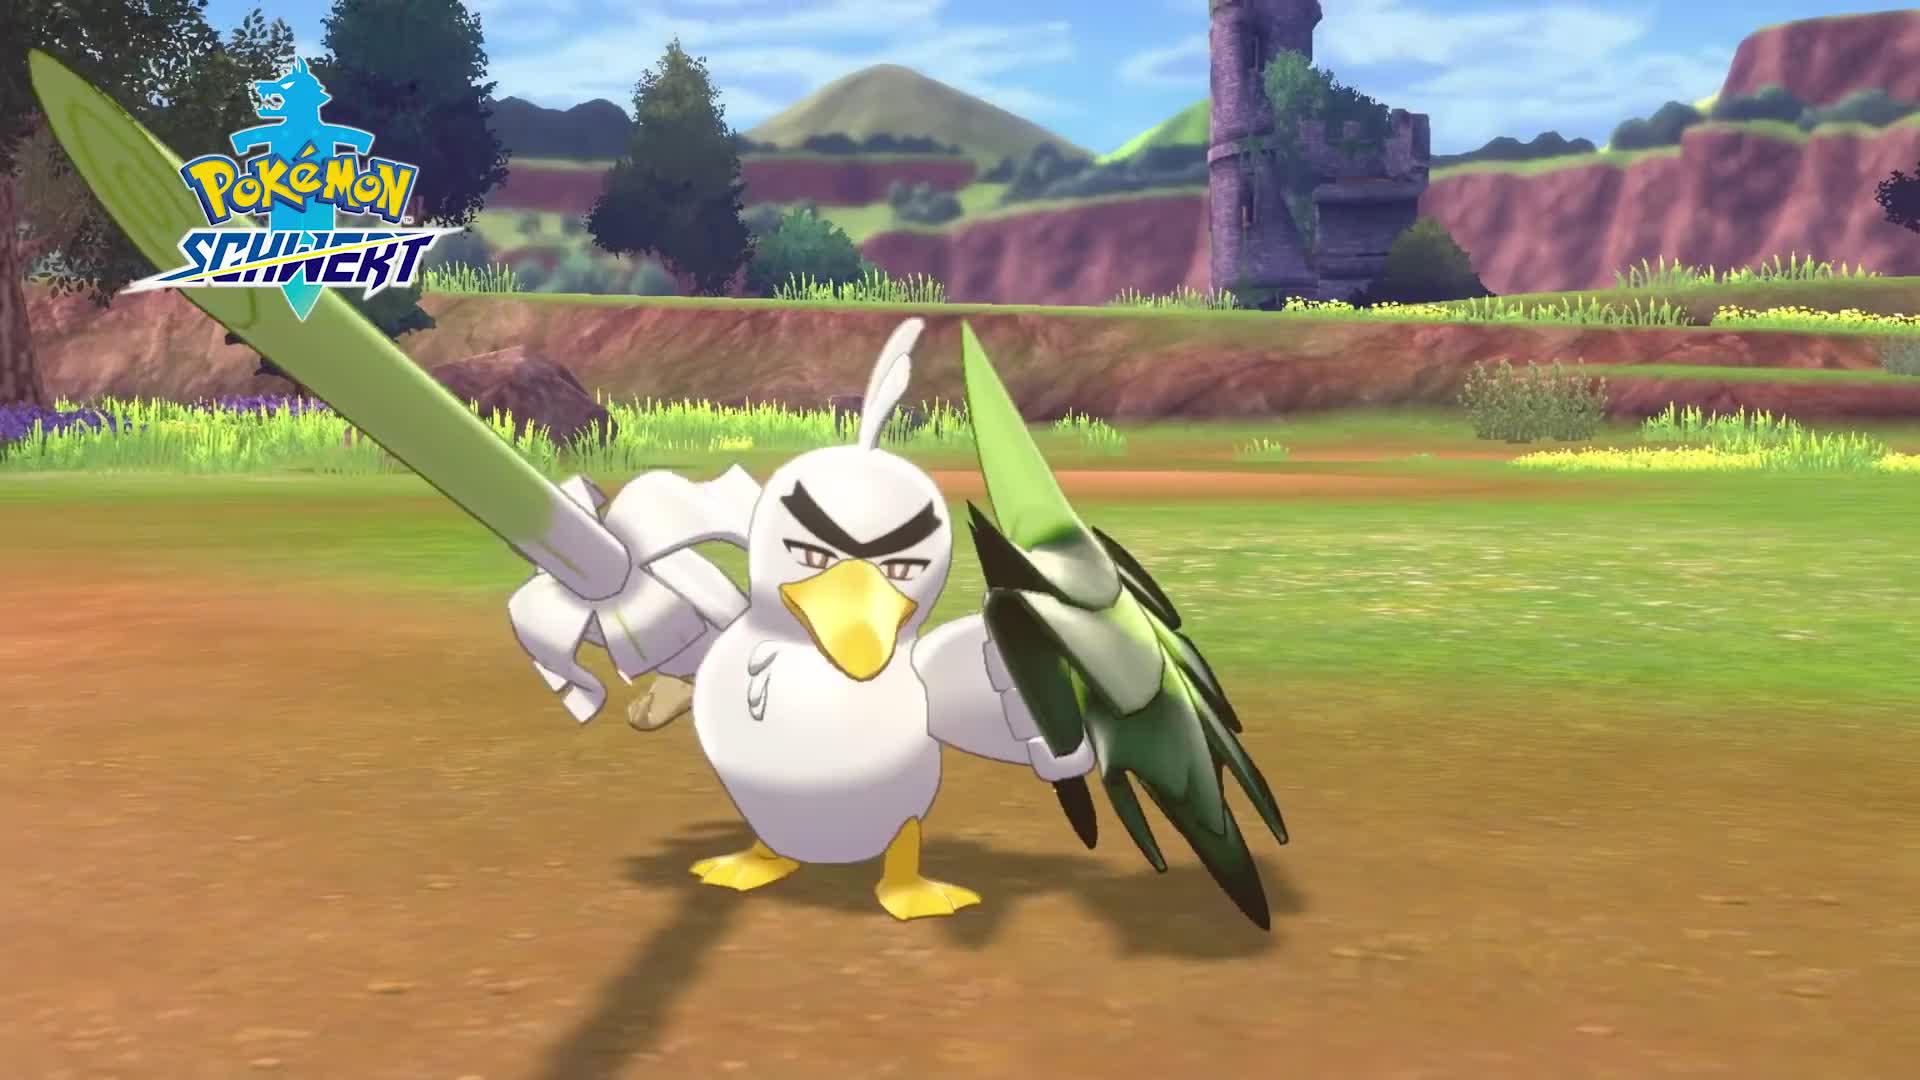 Trailer, Nintendo, Nintendo Switch, Switch, Adventure, Pokemon, Pokémon Schwert, Pokémon Schild